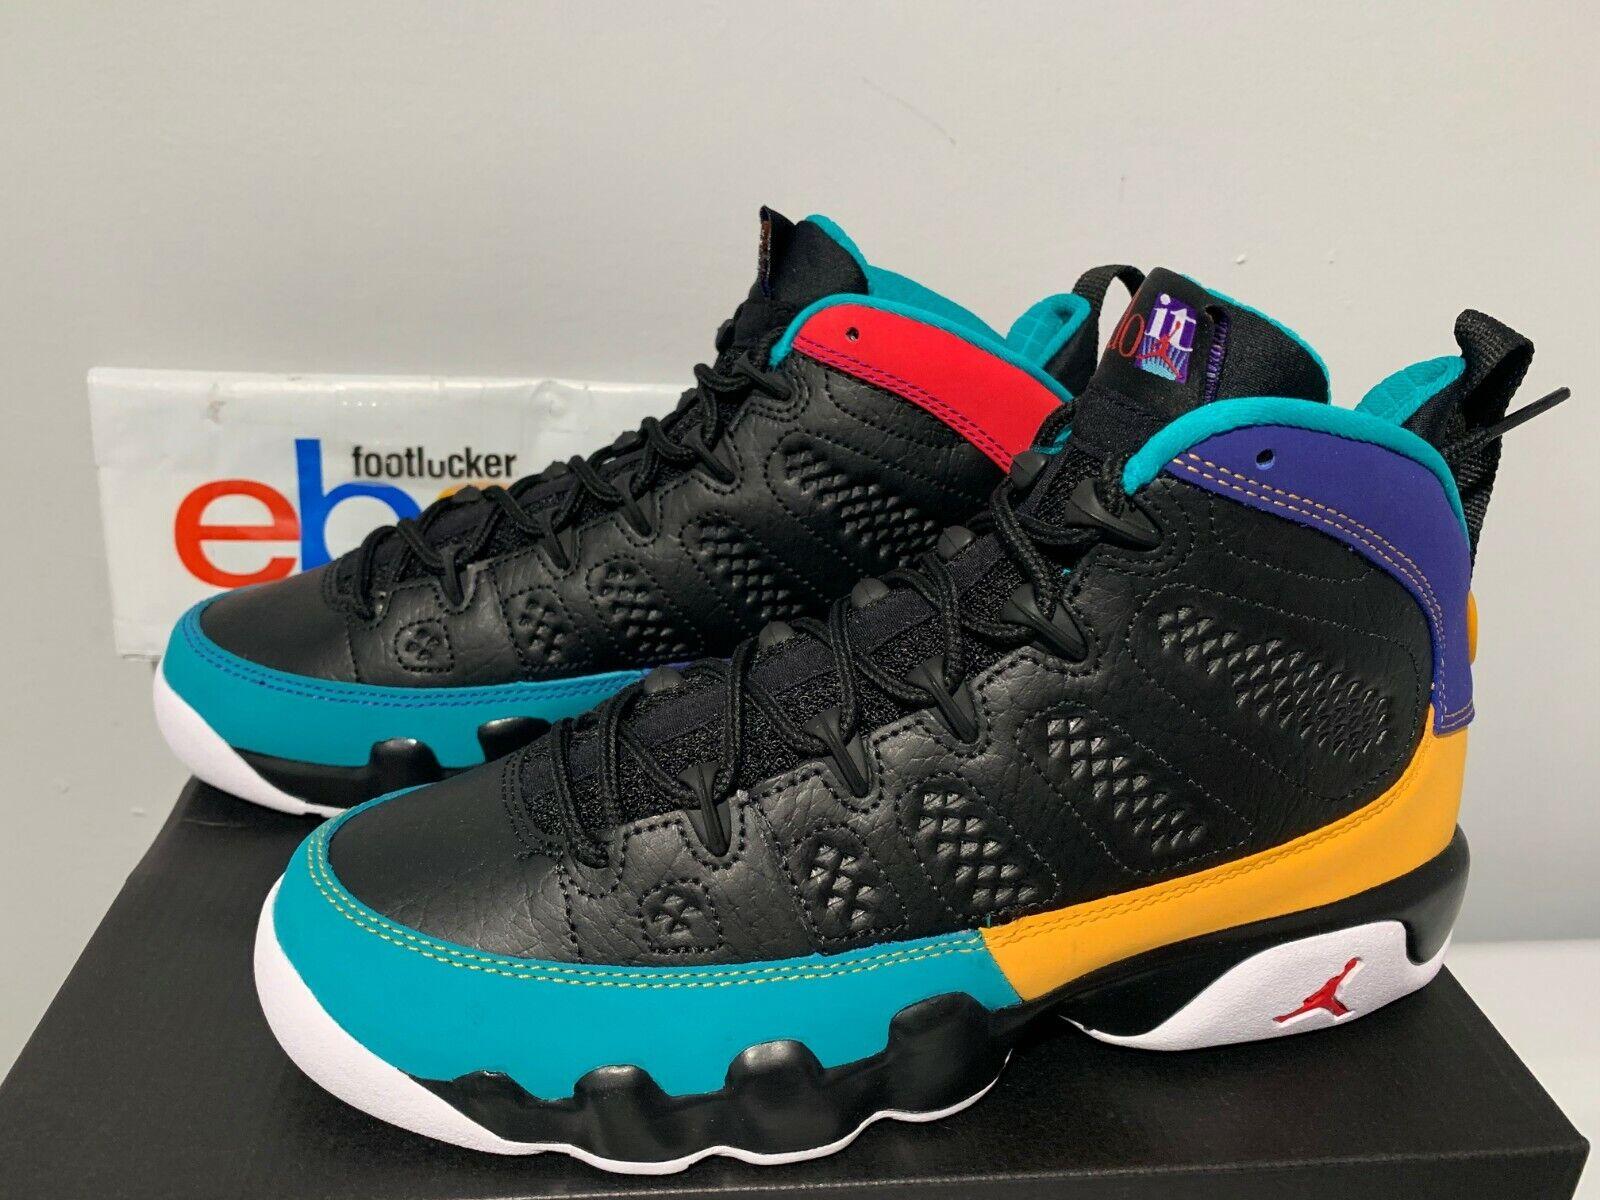 ad8a64537fab Nike Air Jordan 9 Retro Dream It Do It Black Red Concord Kids Toddler Boy  4C-7Y. item